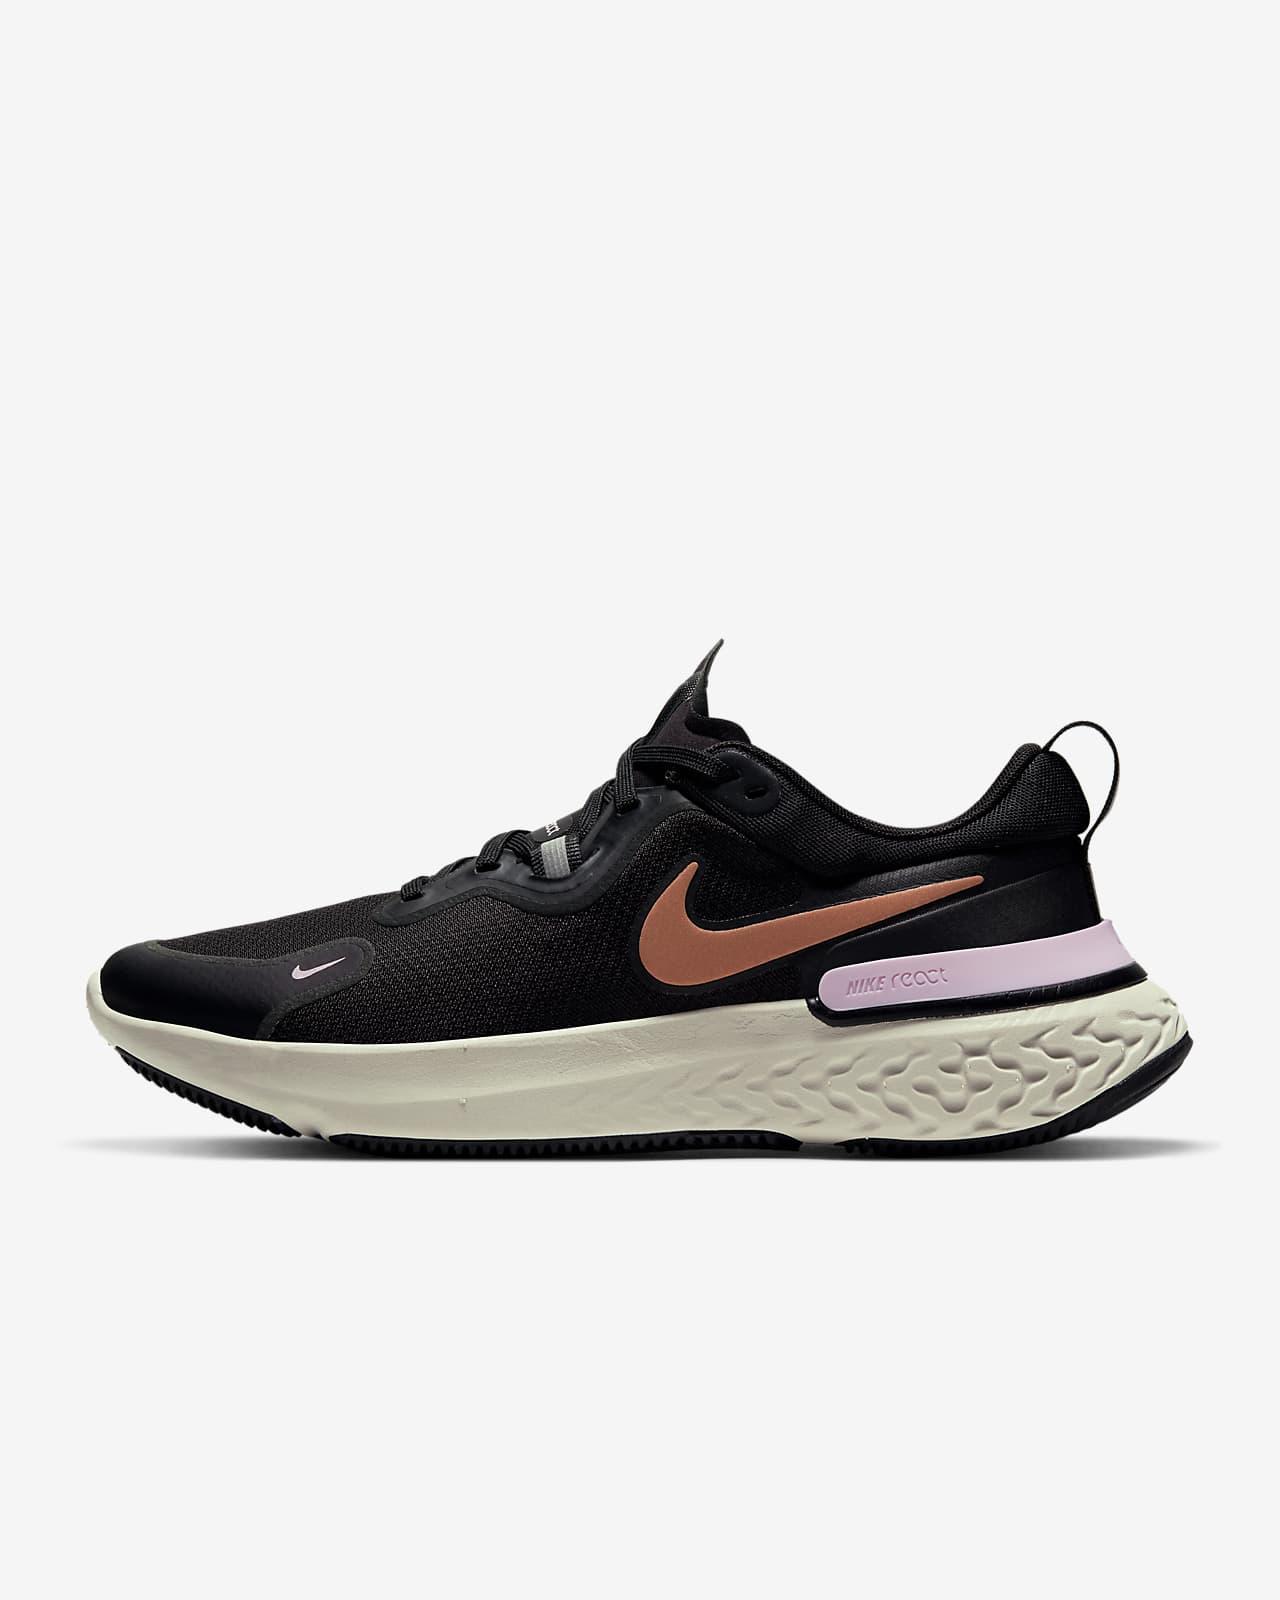 Nike React Miler Women's Running Shoe